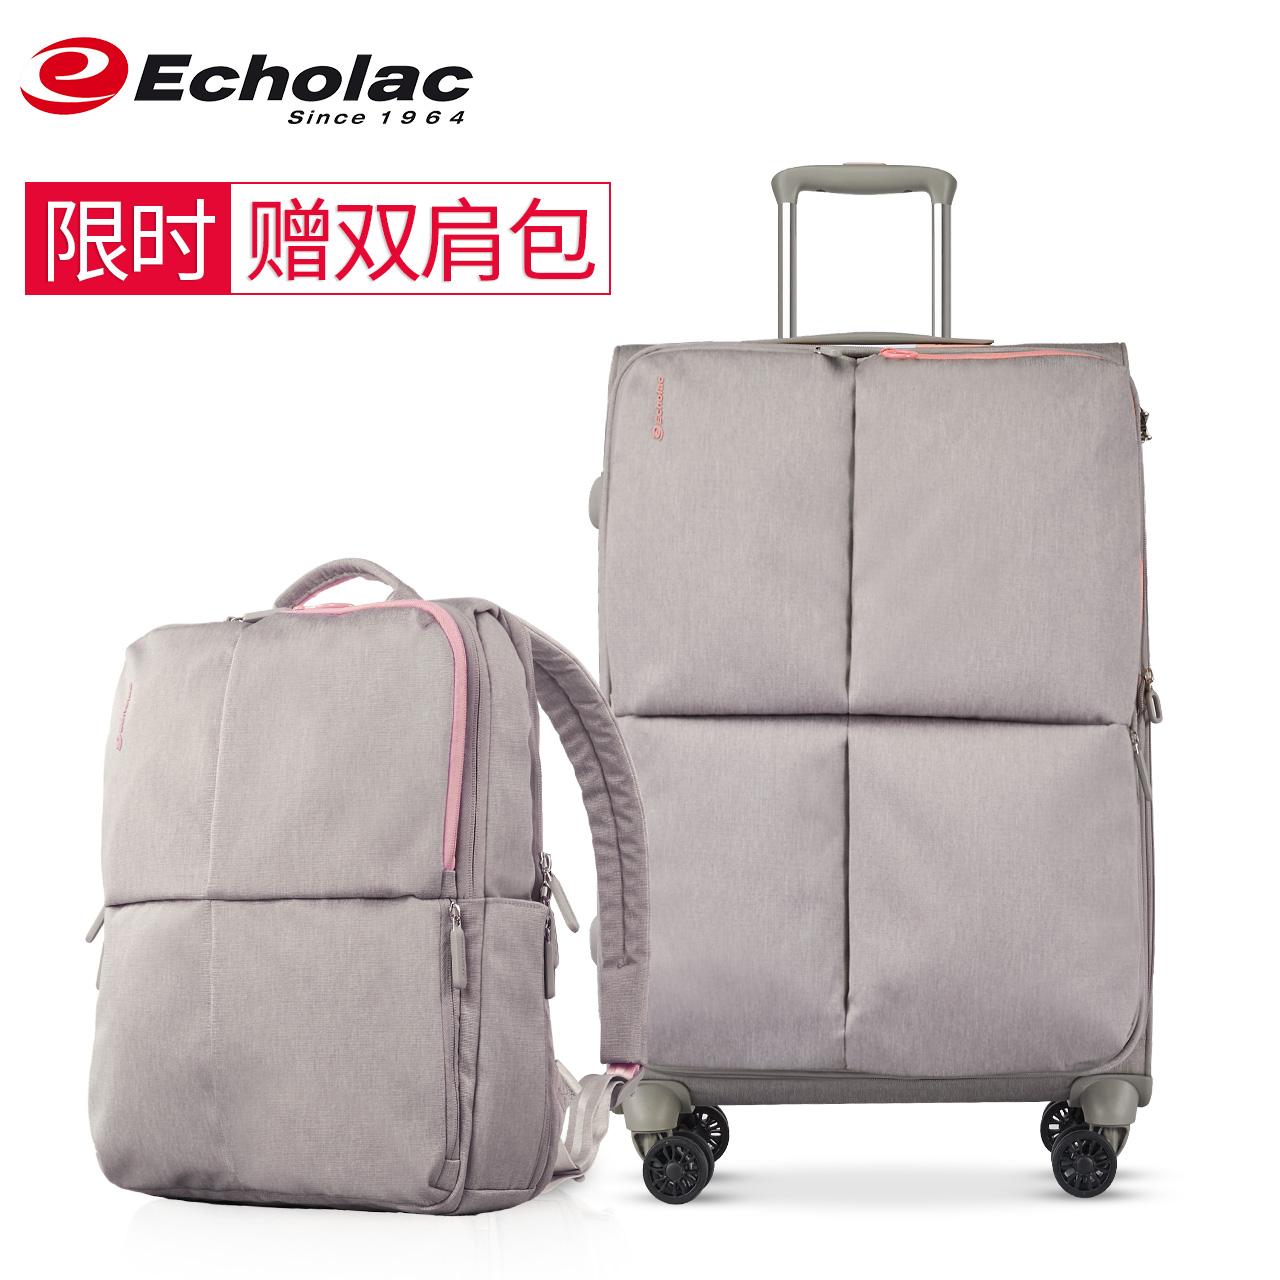 Echolac愛可樂軟箱布行李箱20-24寸拉桿箱萬向輪男女密碼箱登機箱